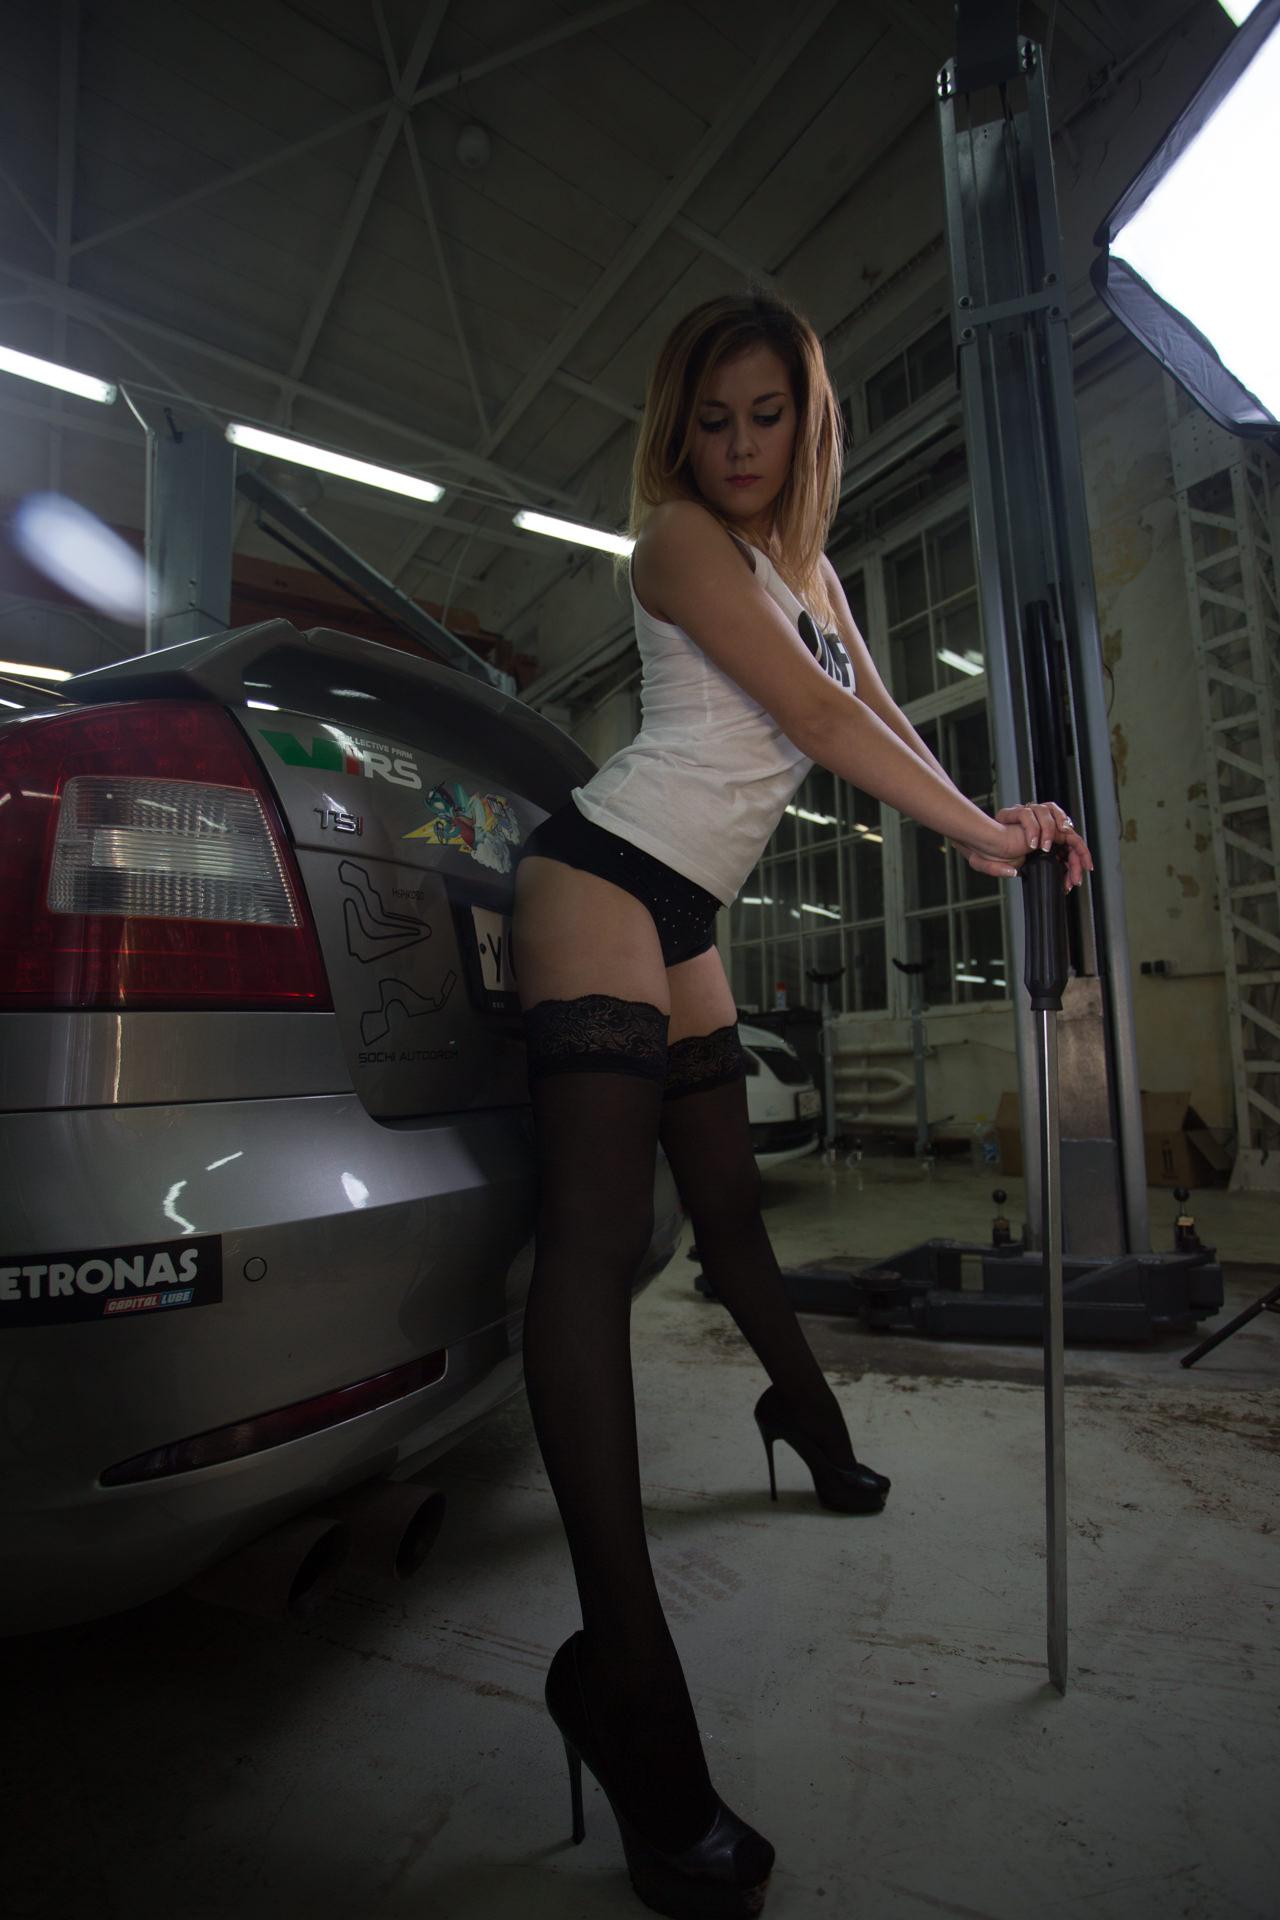 VAG RT Motors